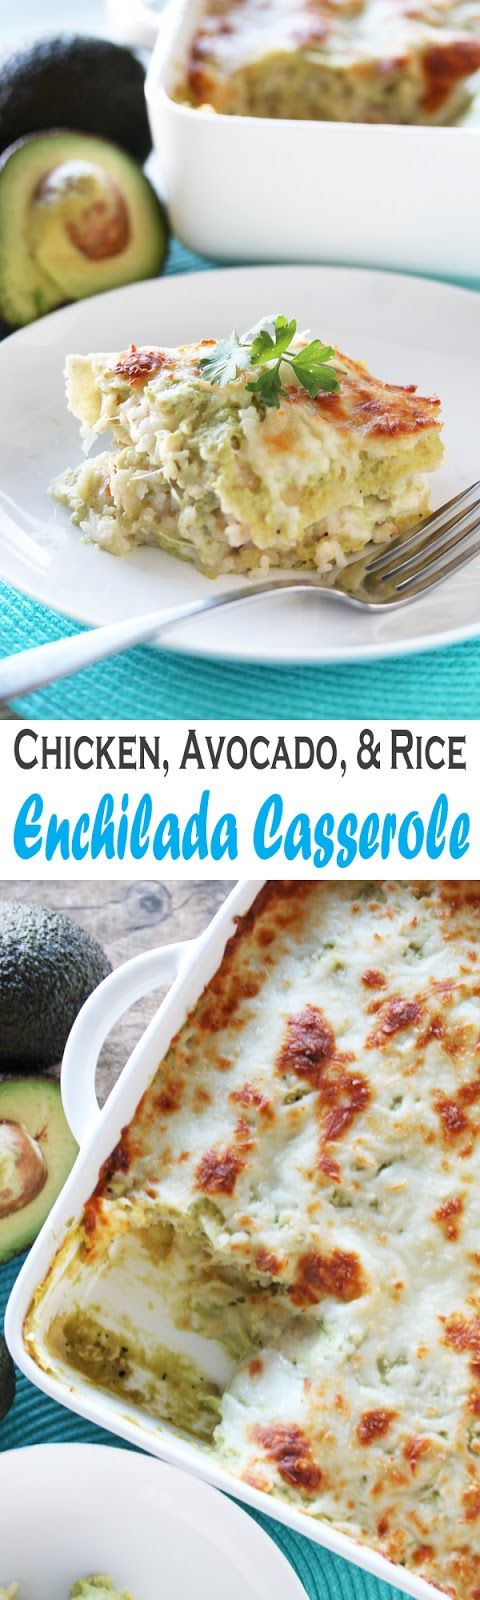 chicken avocado rice enchilada casserole | Creamy avocado ...